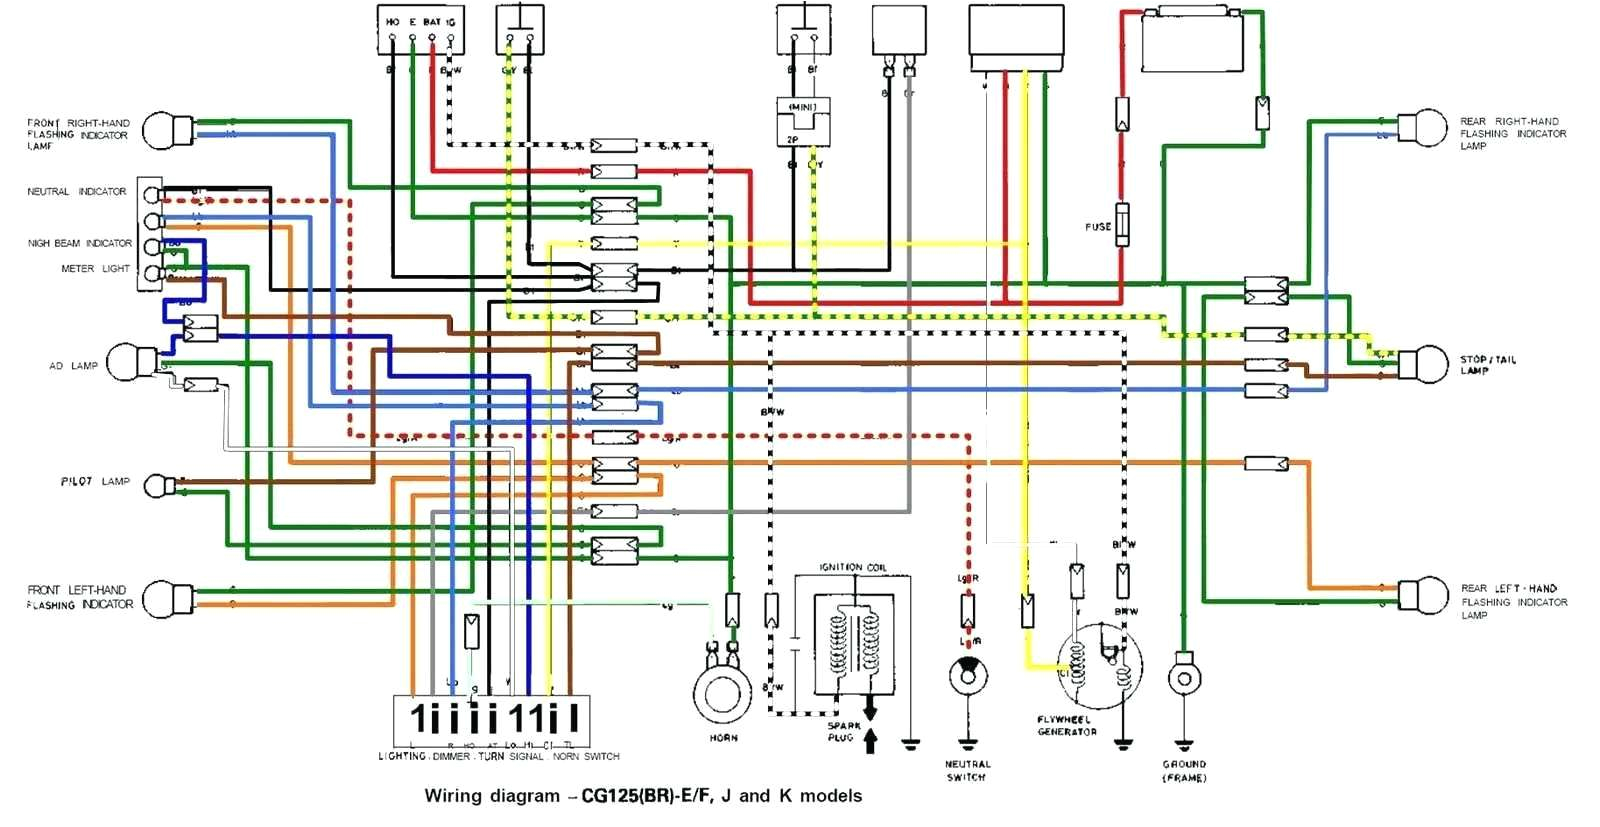 honda xrm 125 wiring diagram photography cheat sheets honda wiring diagram of honda rs 125 wiring diagram of honda rs 125